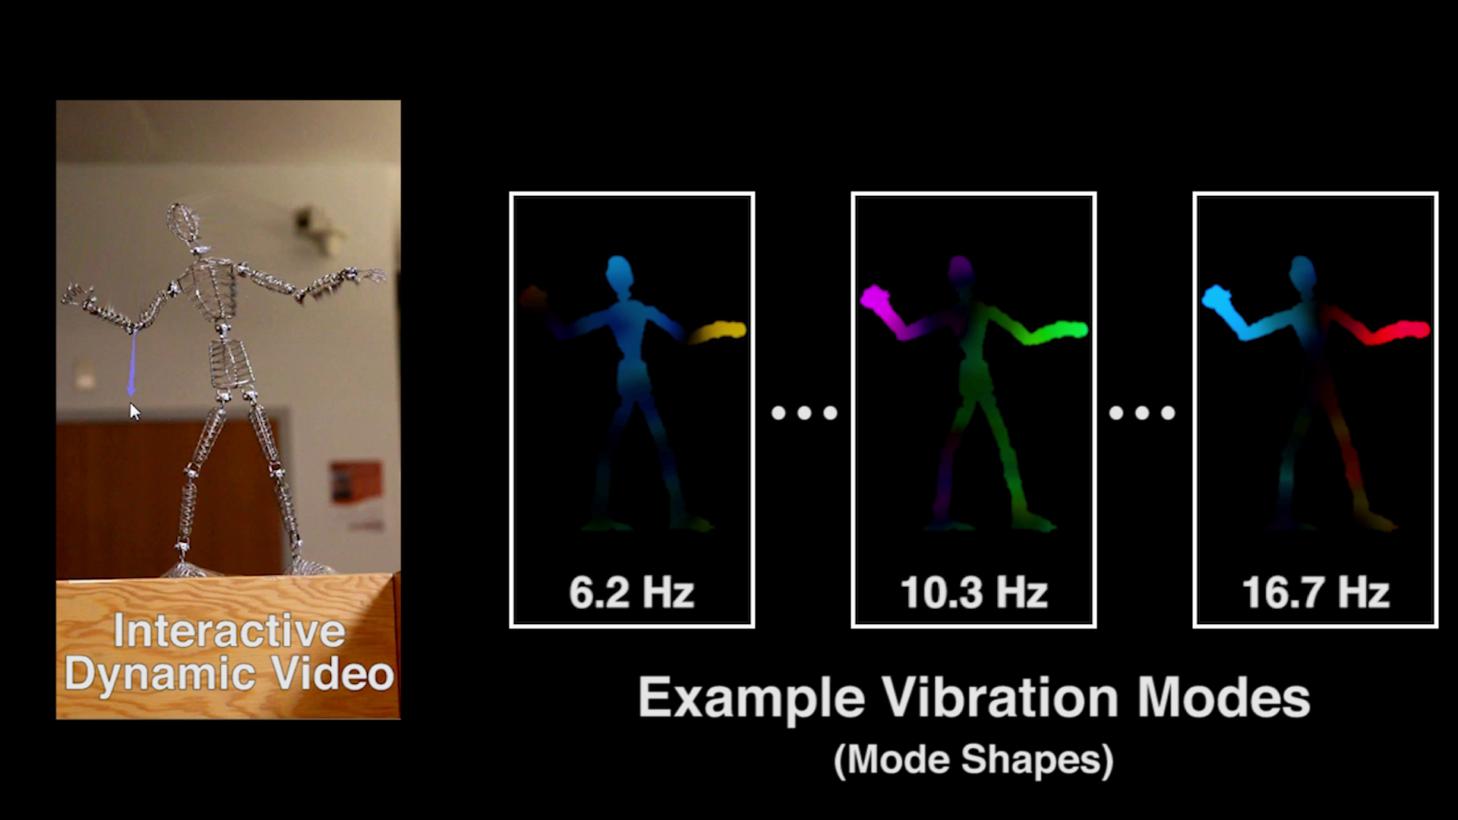 IDV-Vibration-Modes